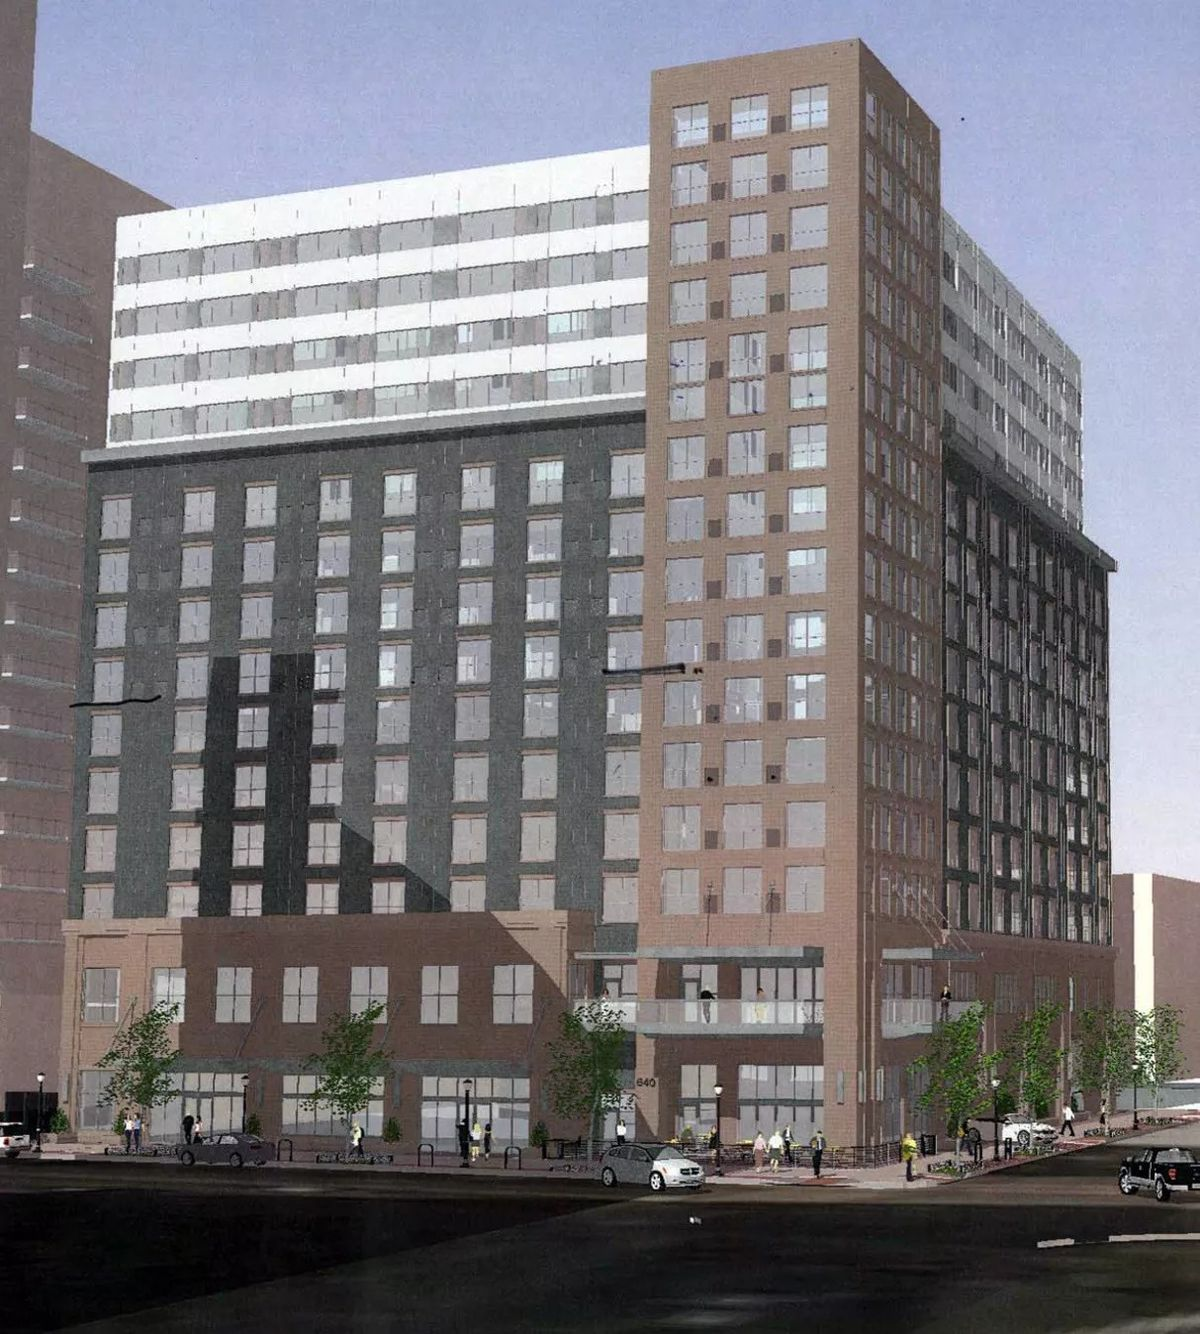 Apartments In Atlanta Ga Under 1200: At Prominent Midtown Atlanta Intersection, Revised Hotel